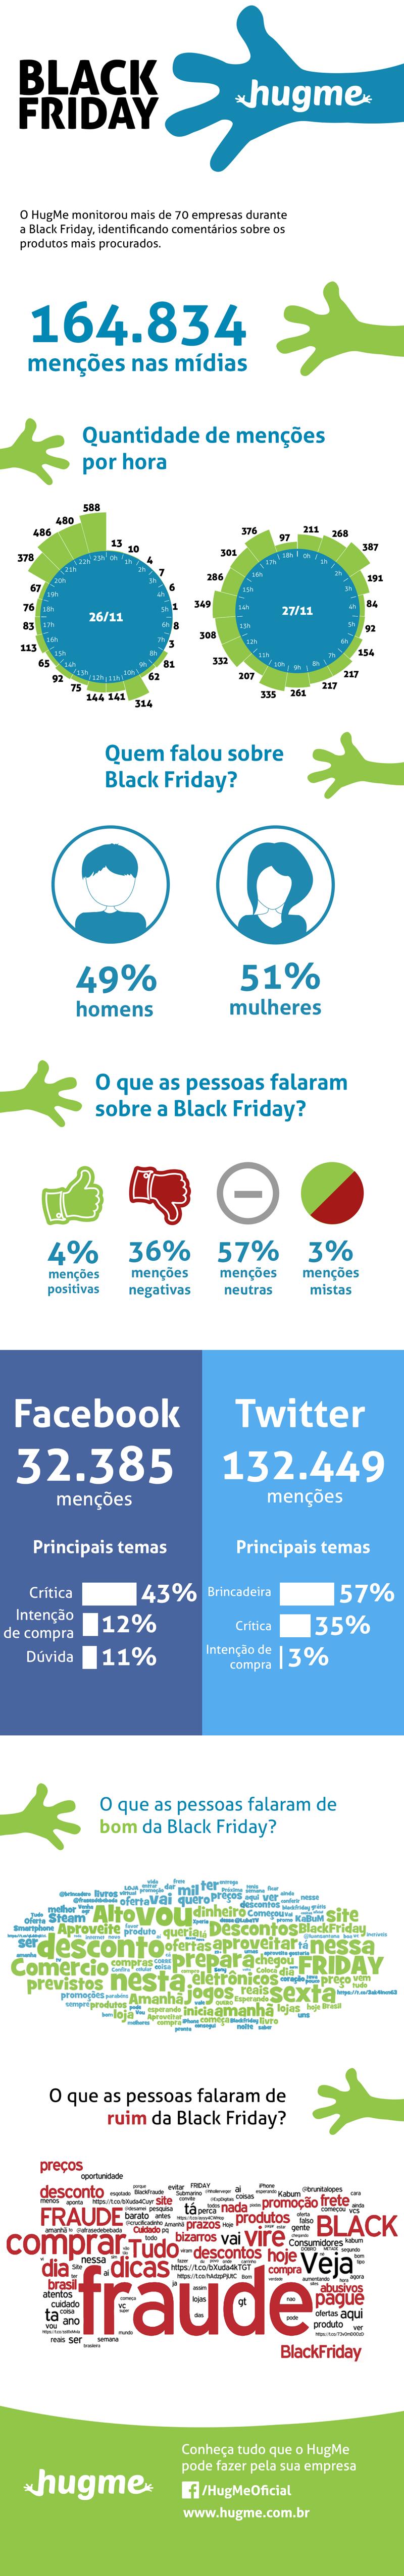 infografico-blog